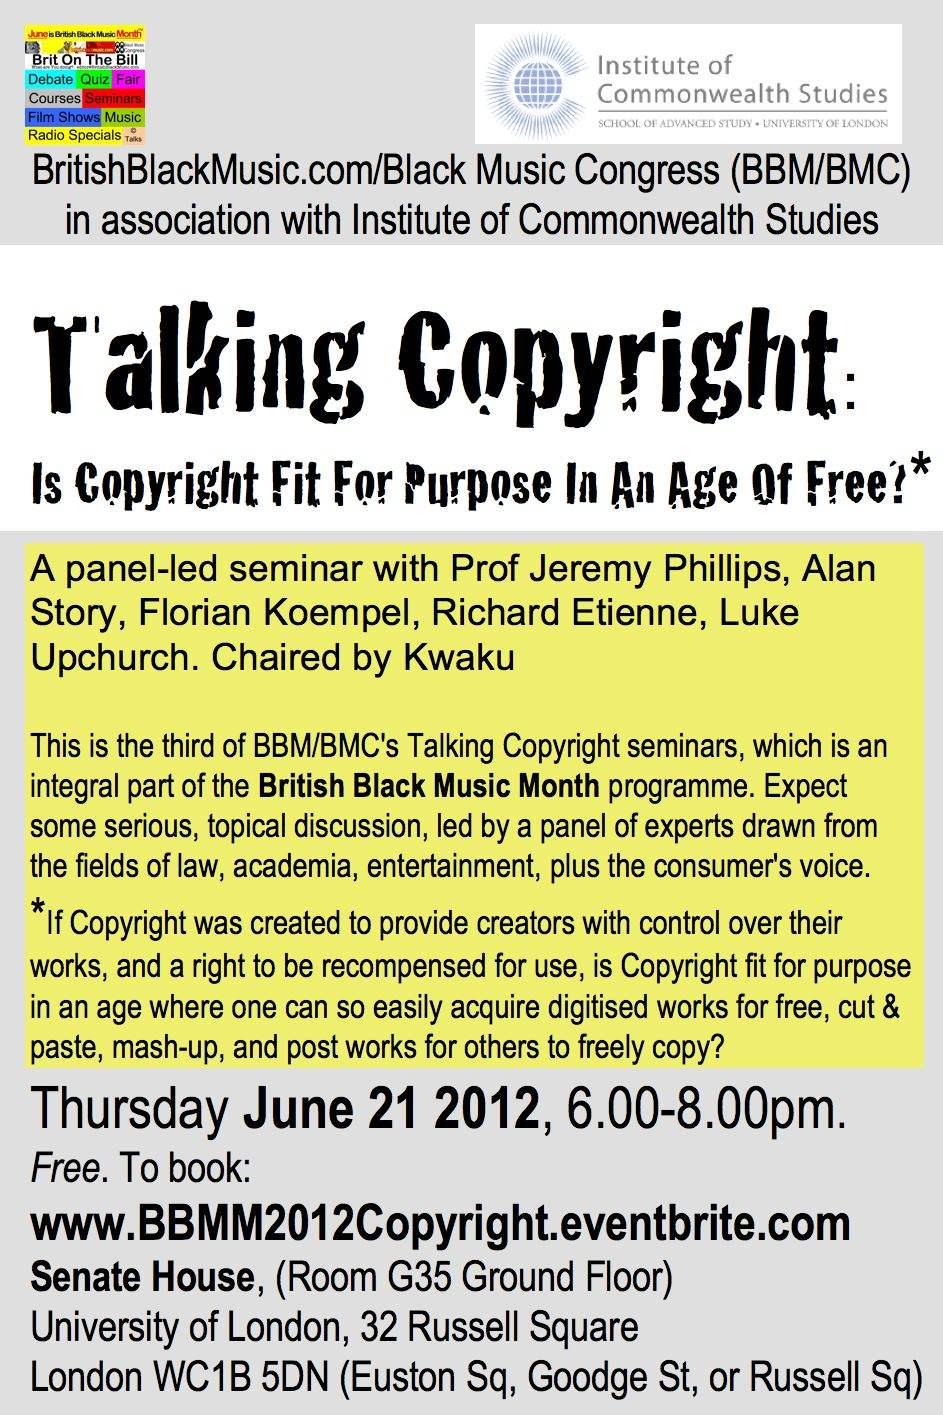 BBMM2012 Copyright flyer